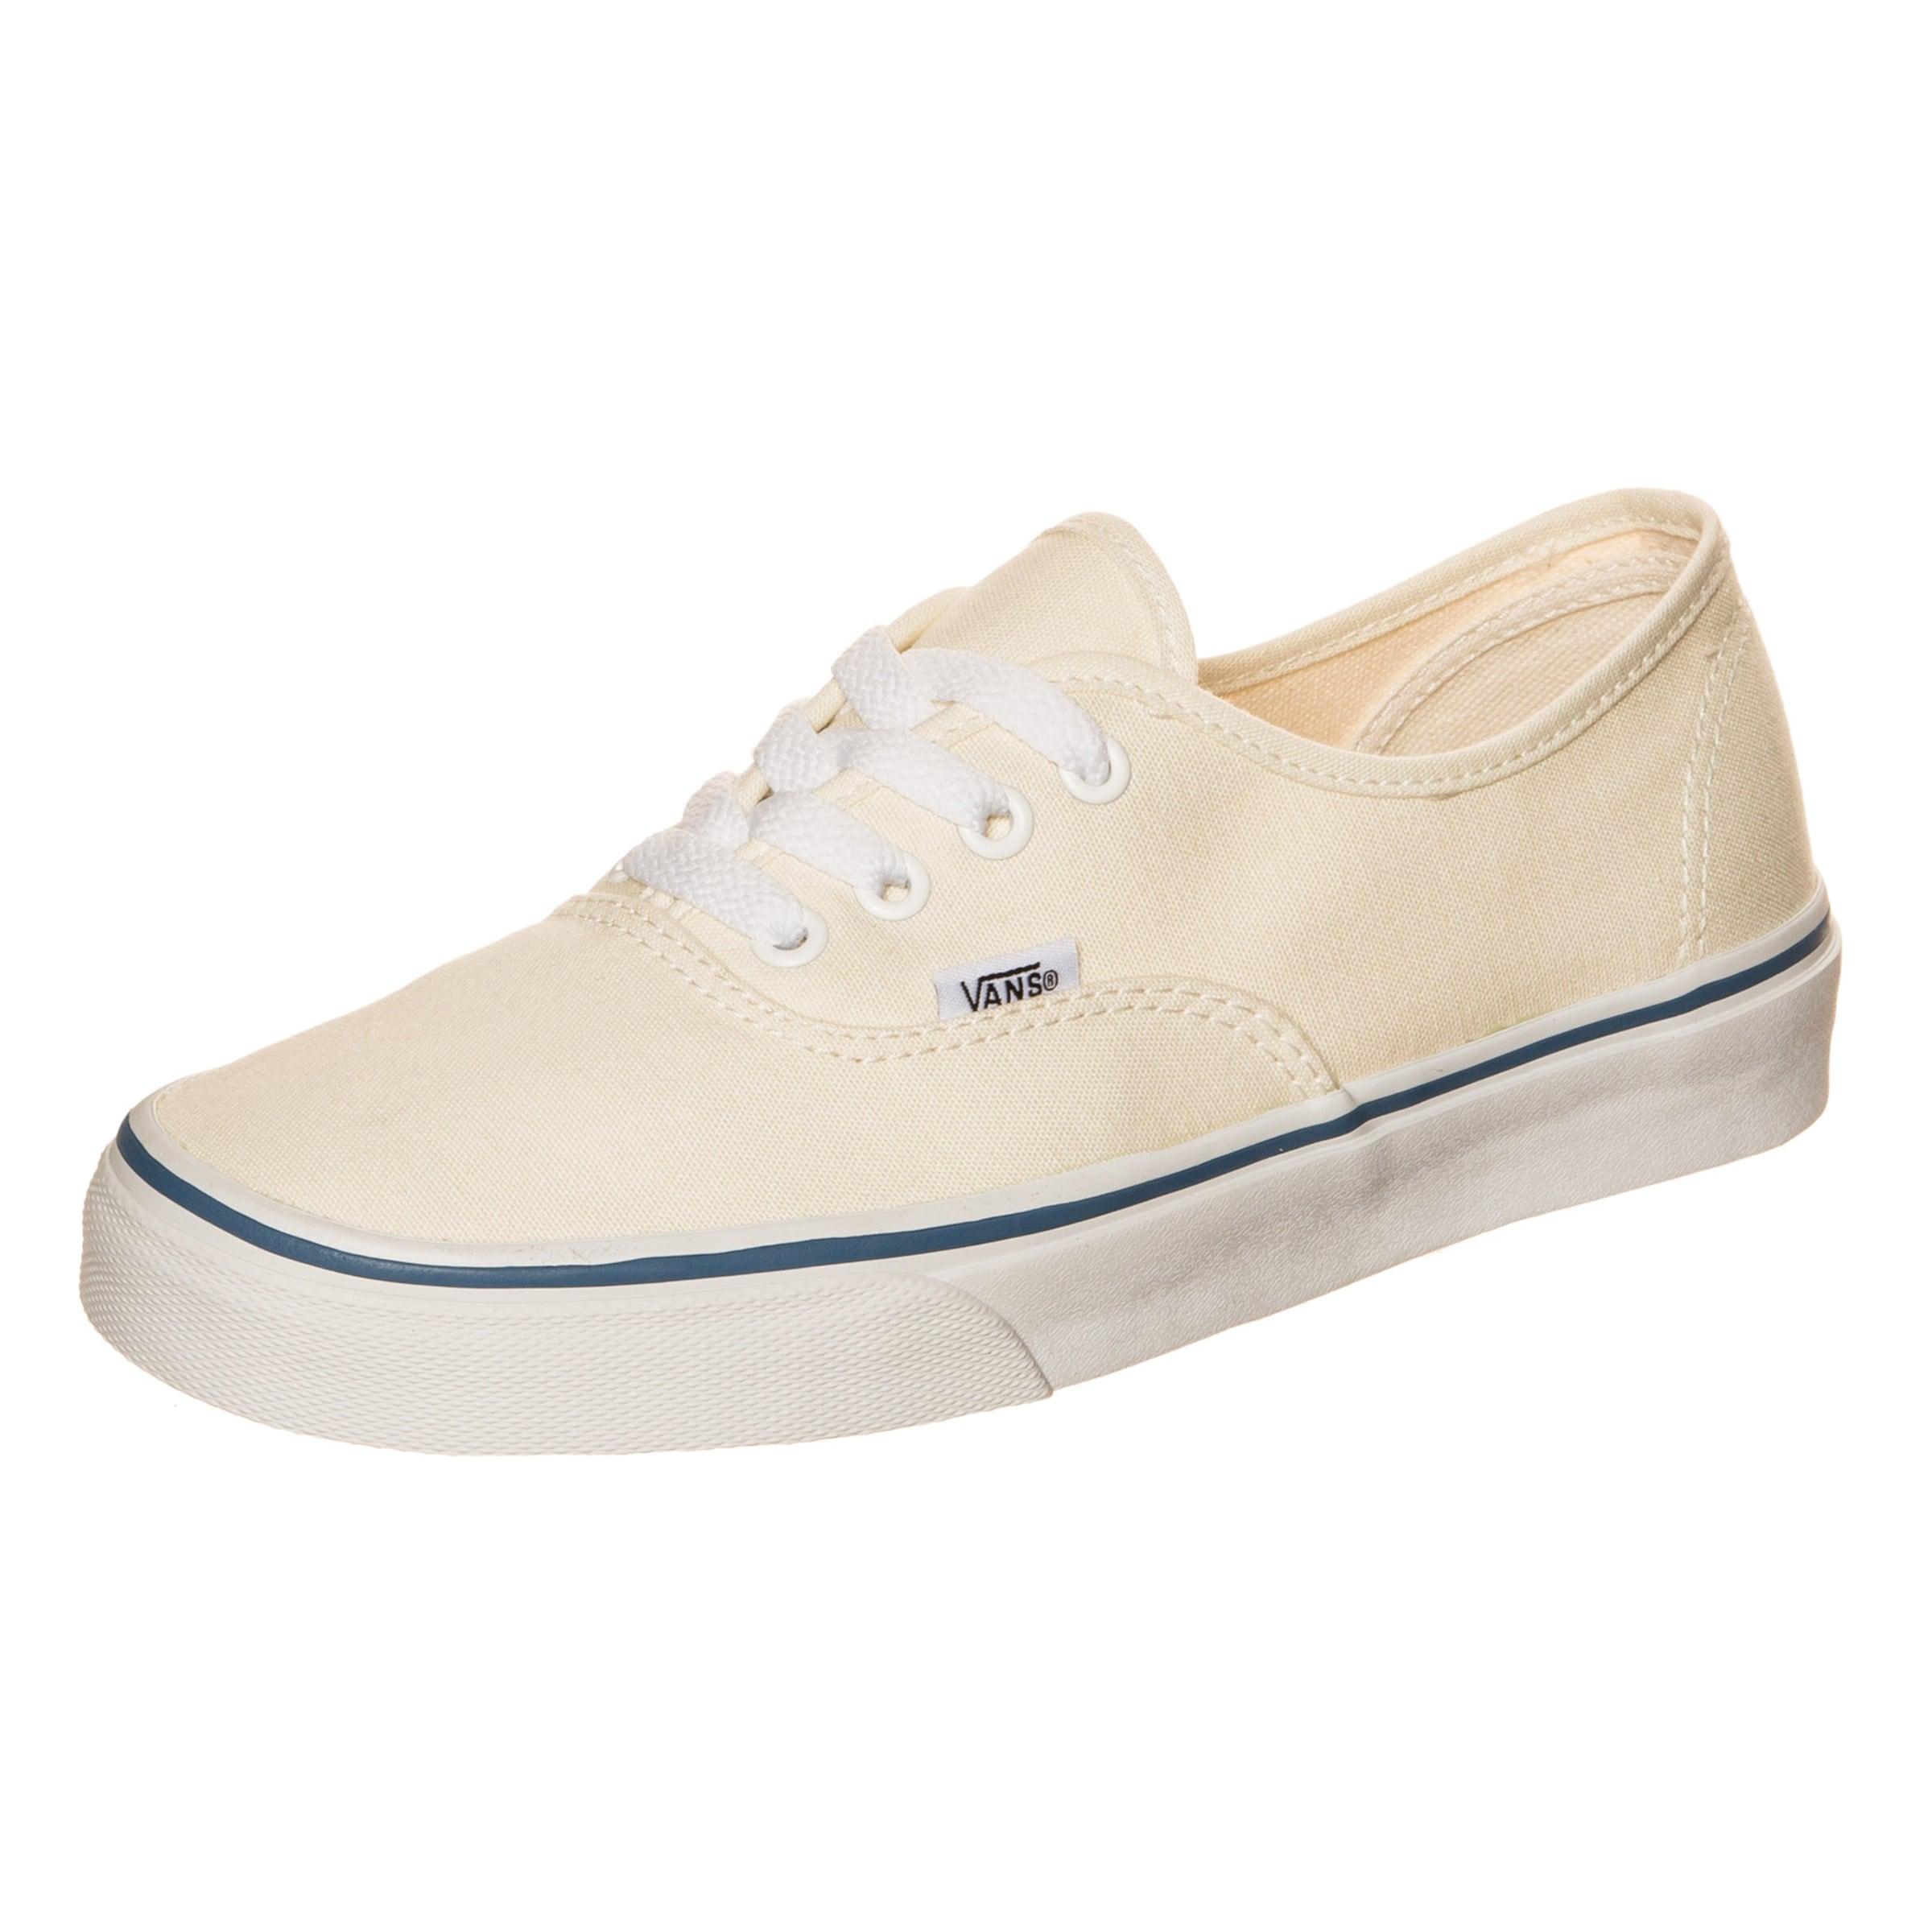 VANS Sneaker Authentic Günstige und langlebige Schuhe